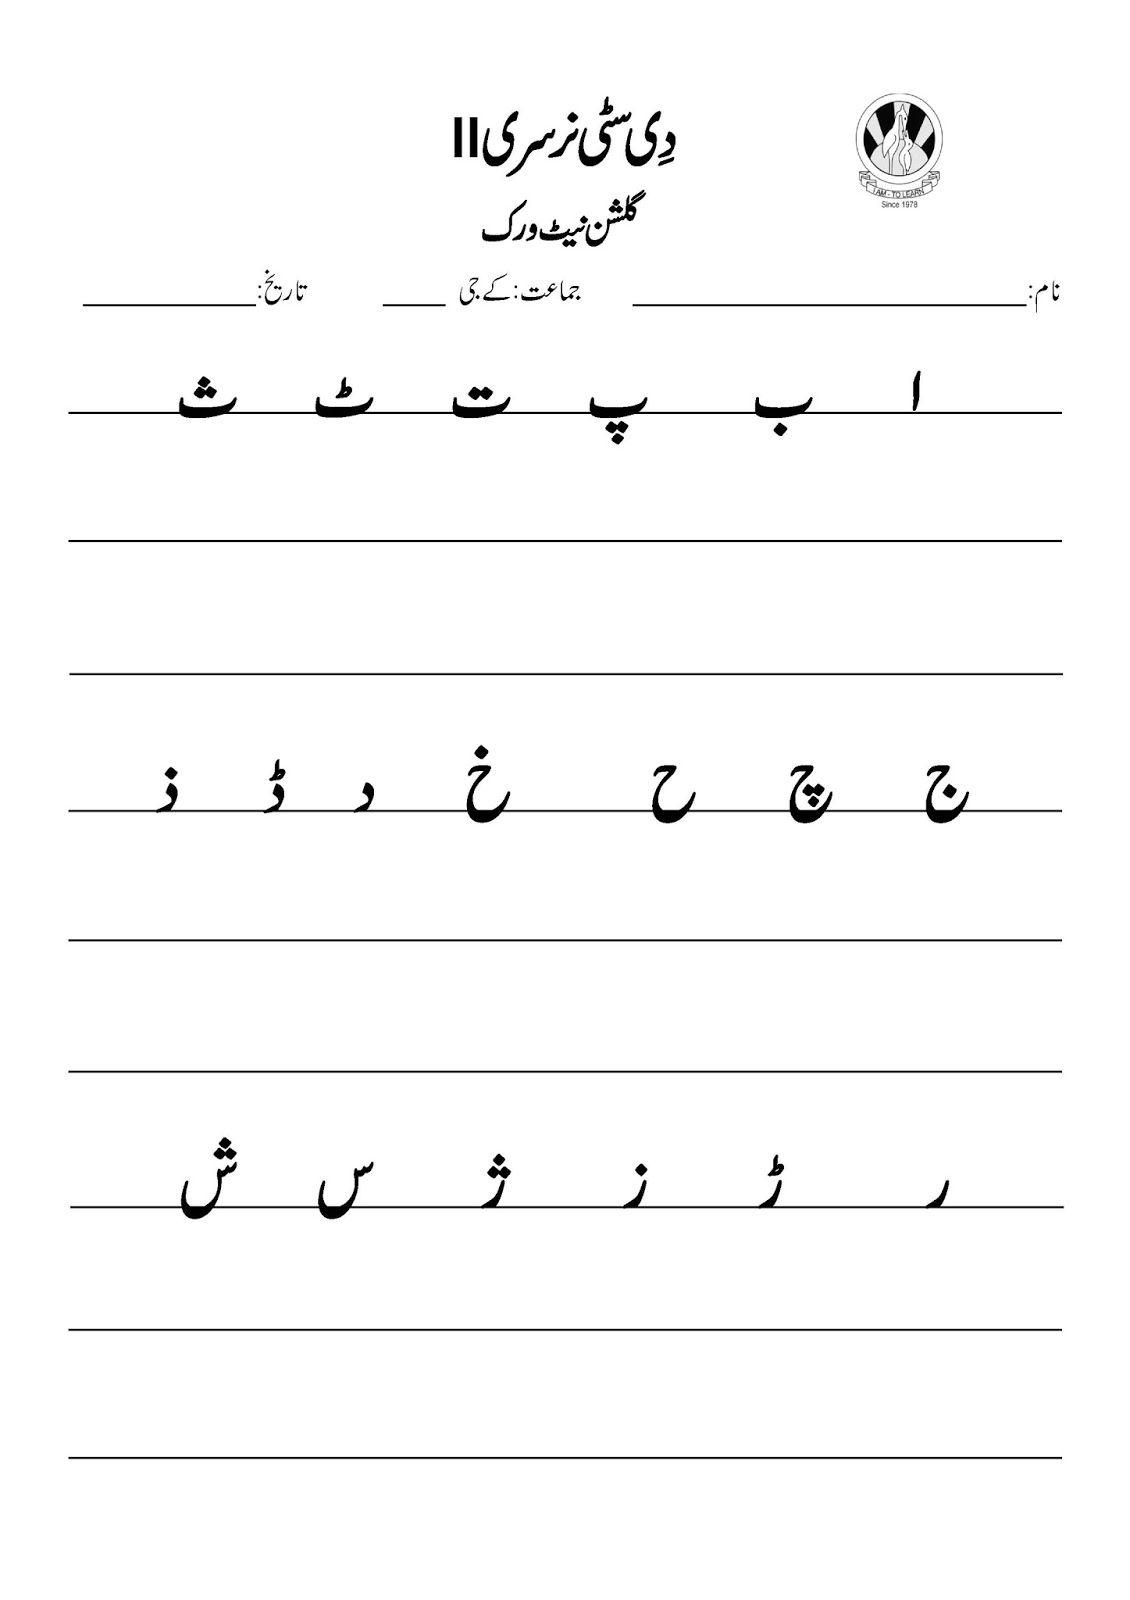 Tracing Urdu Letters